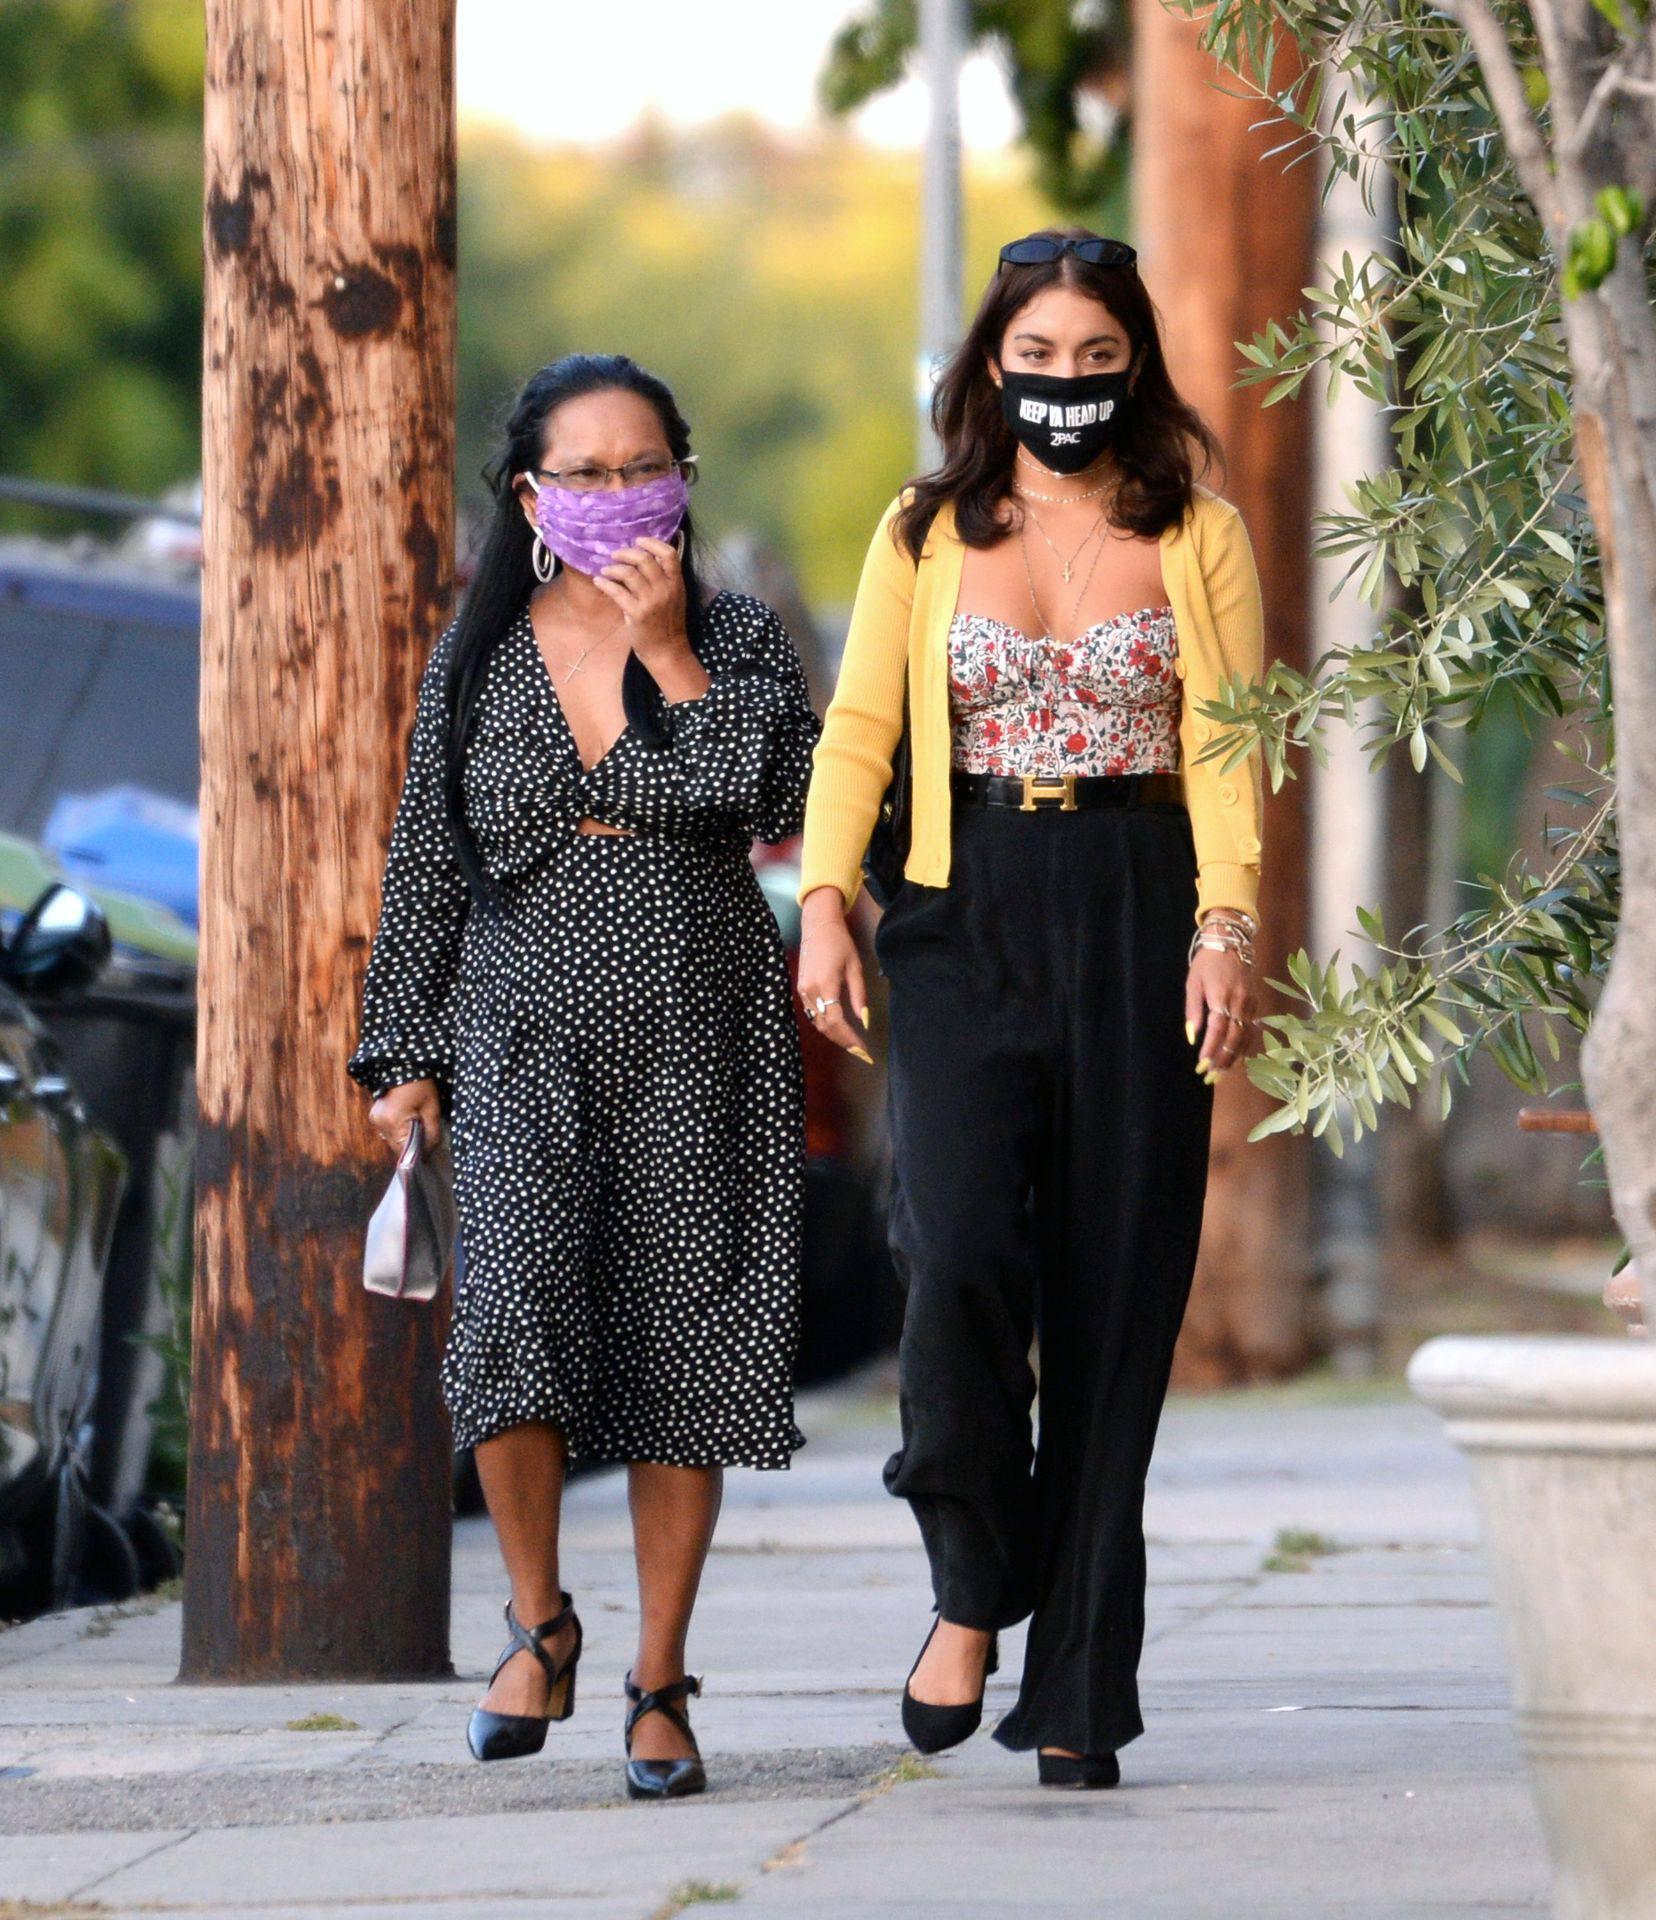 Vanessa Hudgens – Sexy Boobs And Ass At Farfalla In Los Angeles 0010